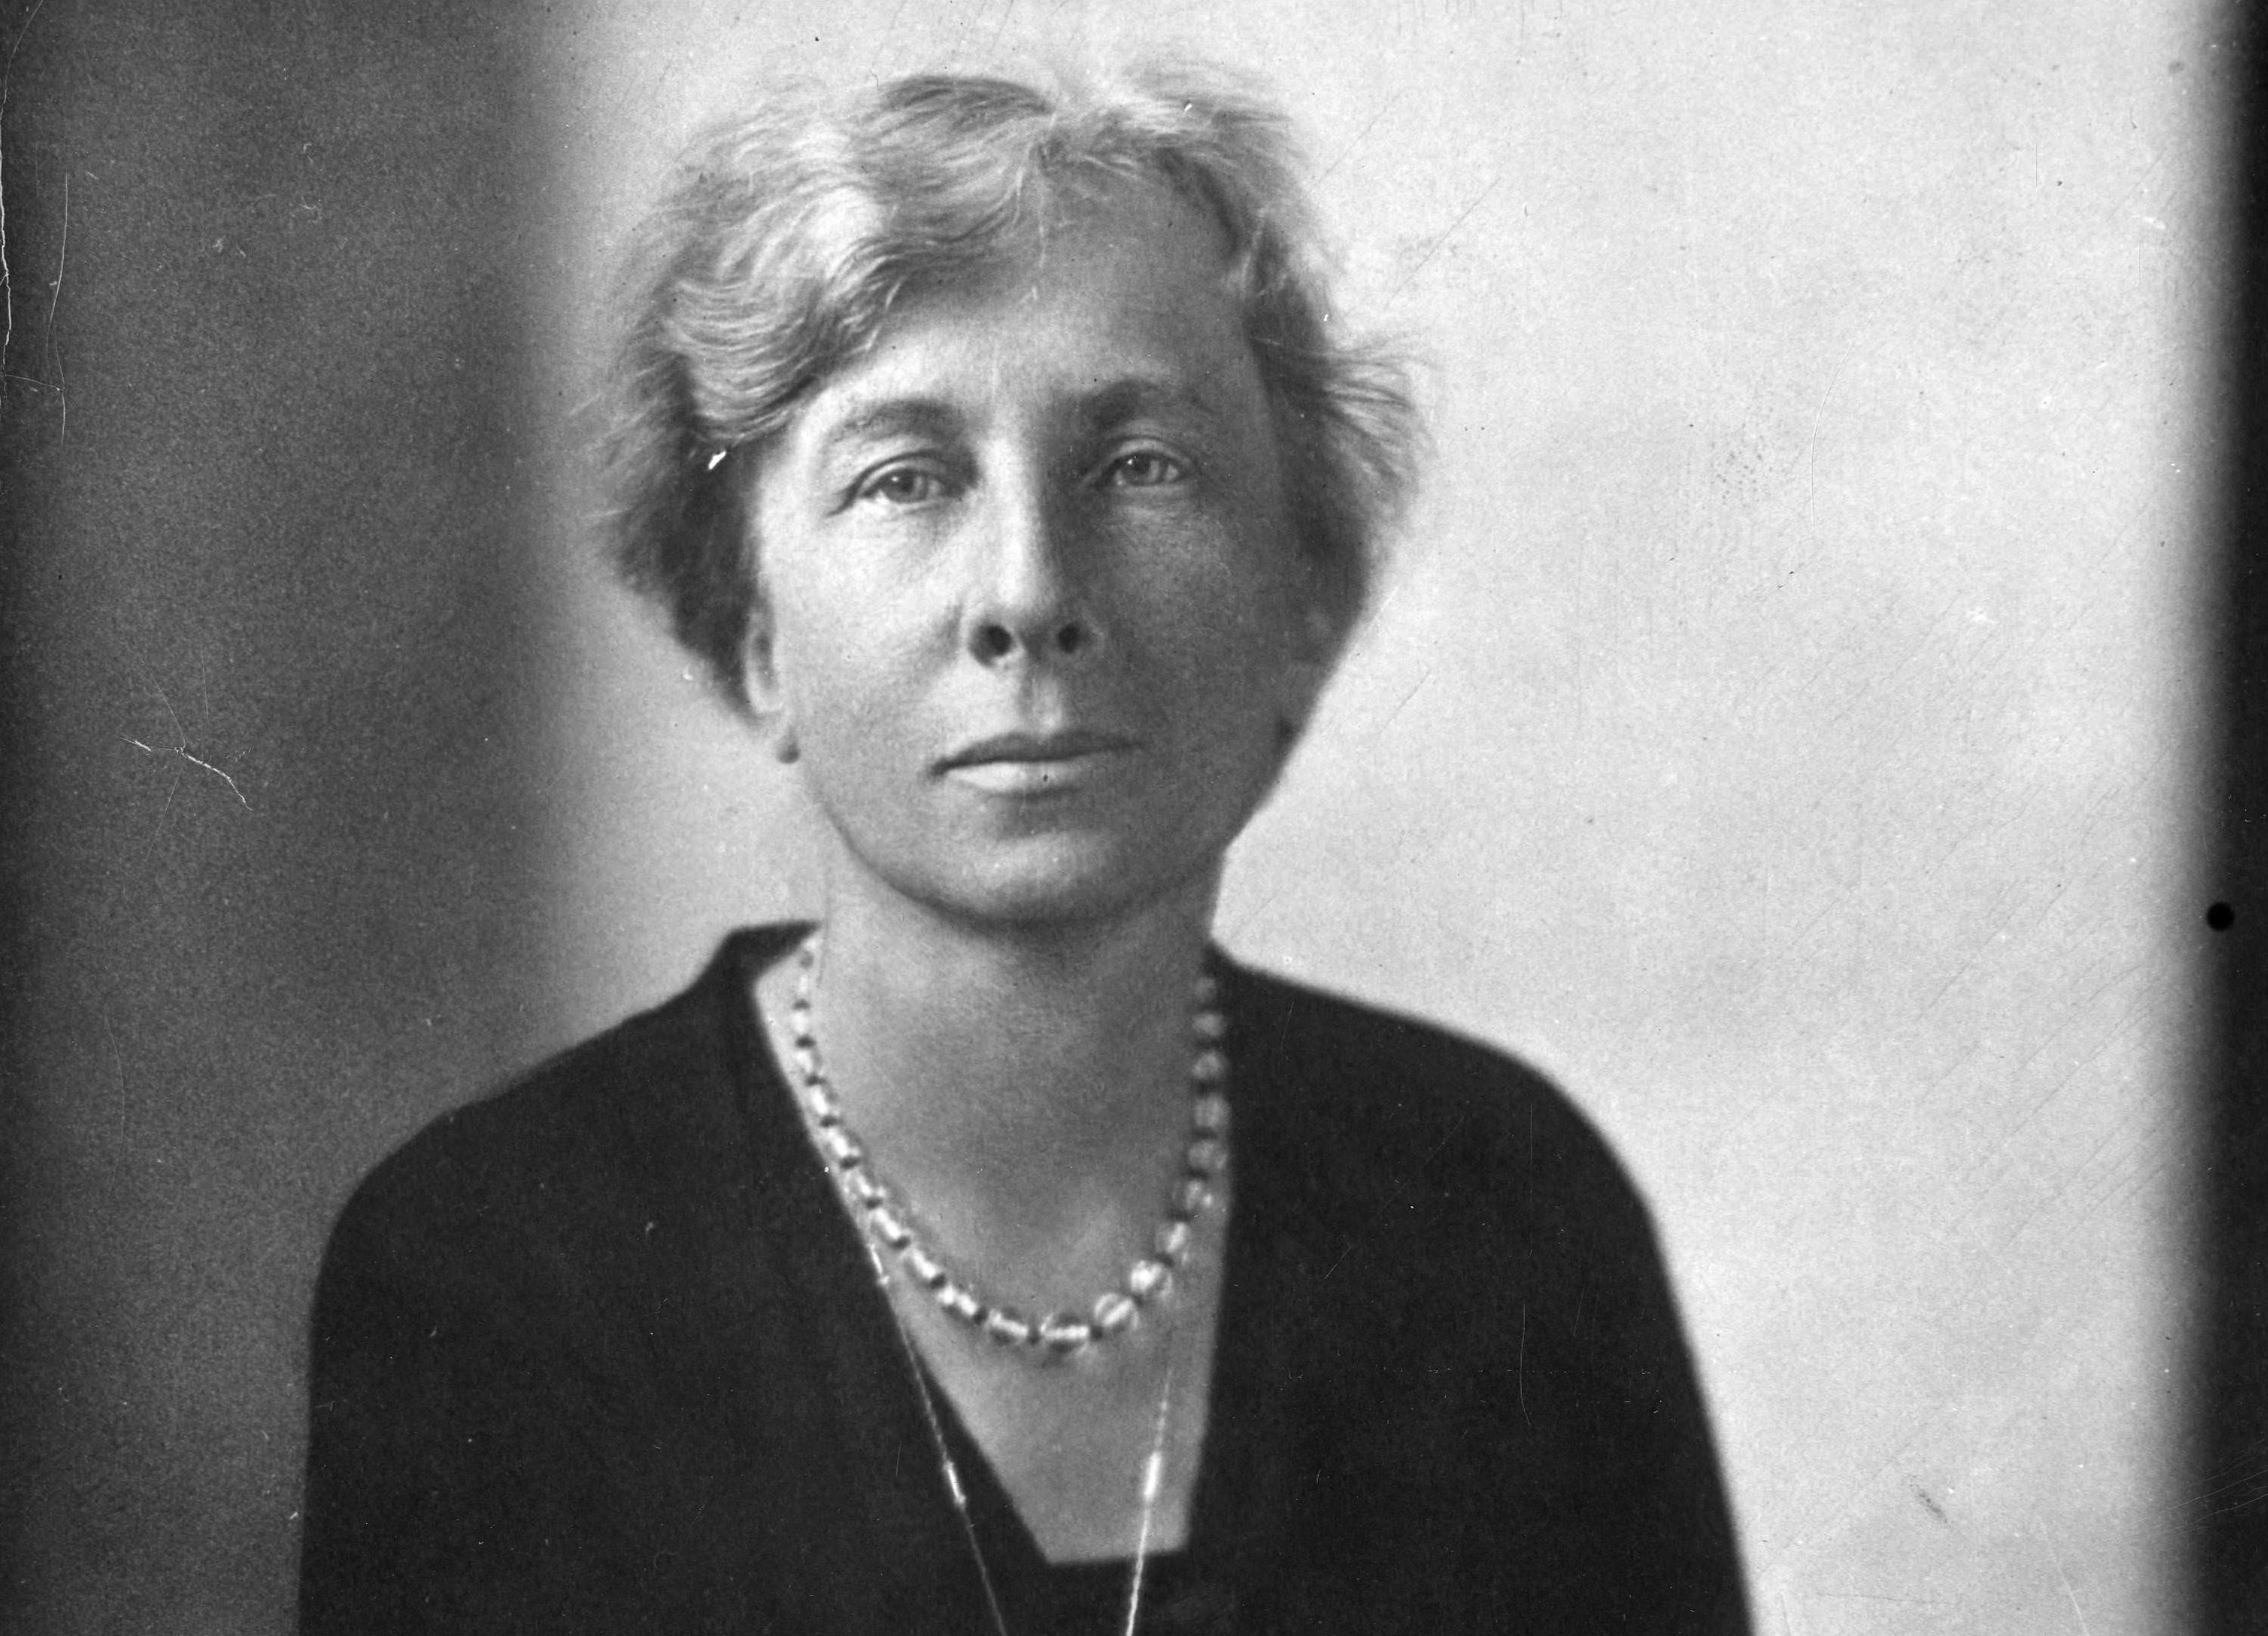 Žene naučnice: Lilijan Gilbert i istorija menadžmenta